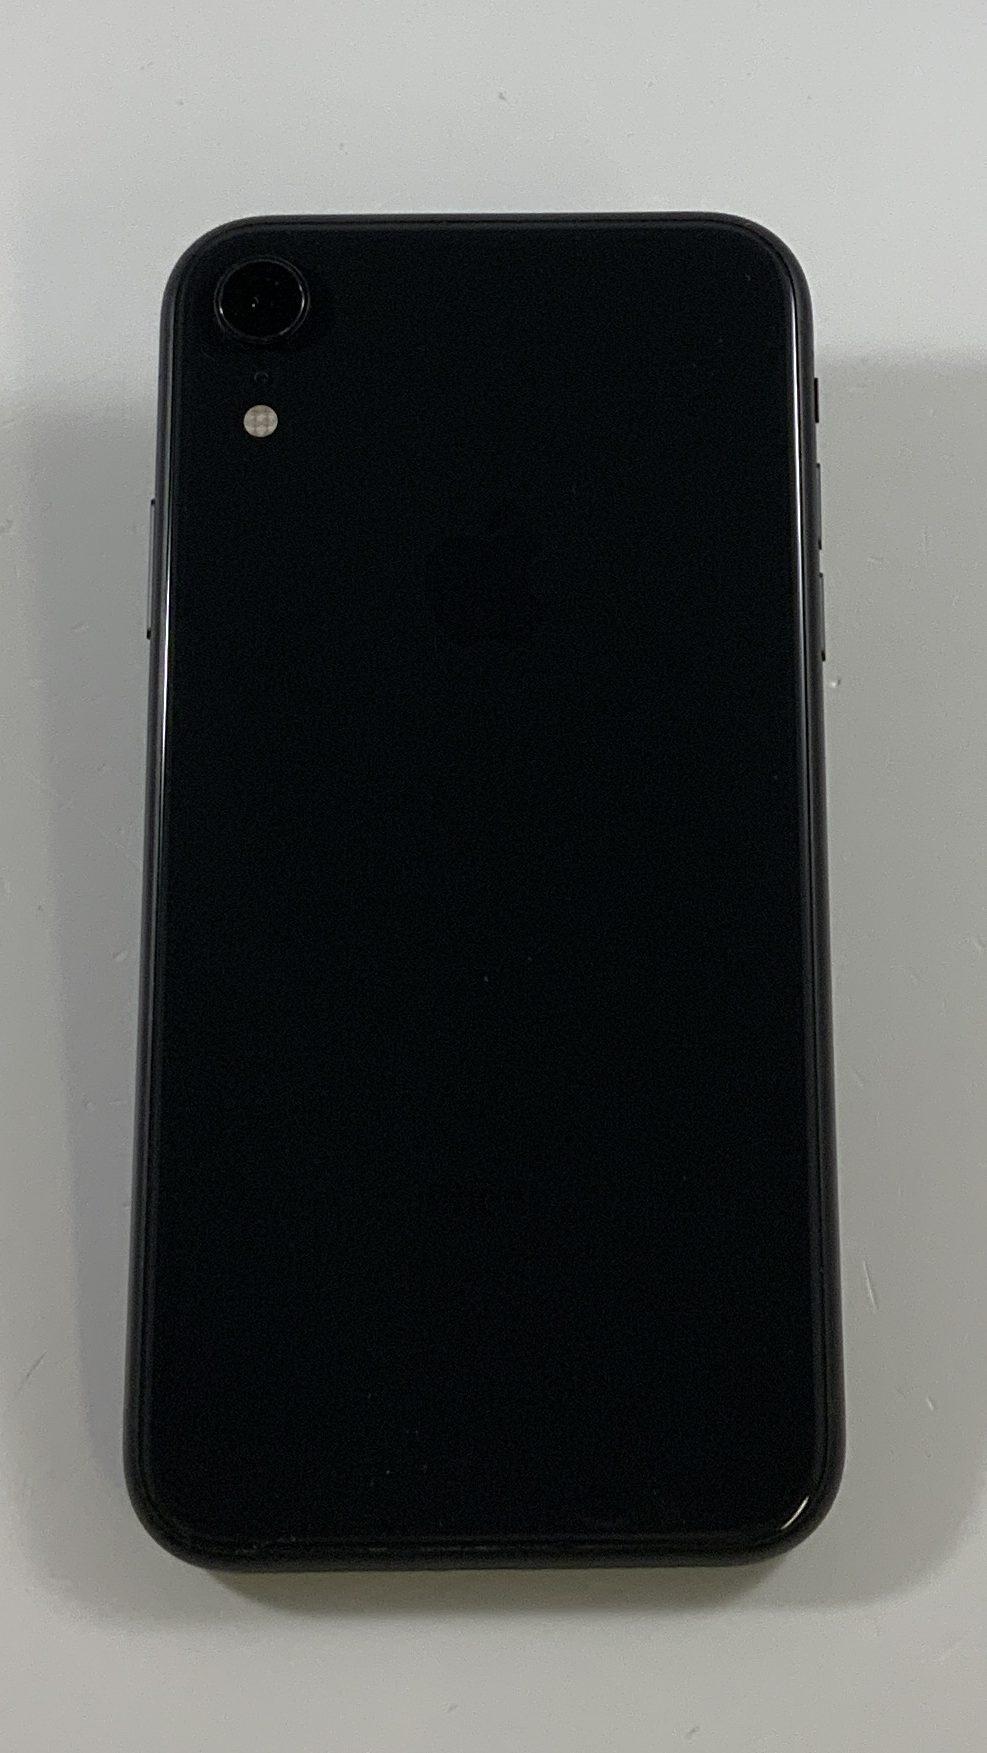 iPhone XR 128GB, 128GB, Black, Afbeelding 2